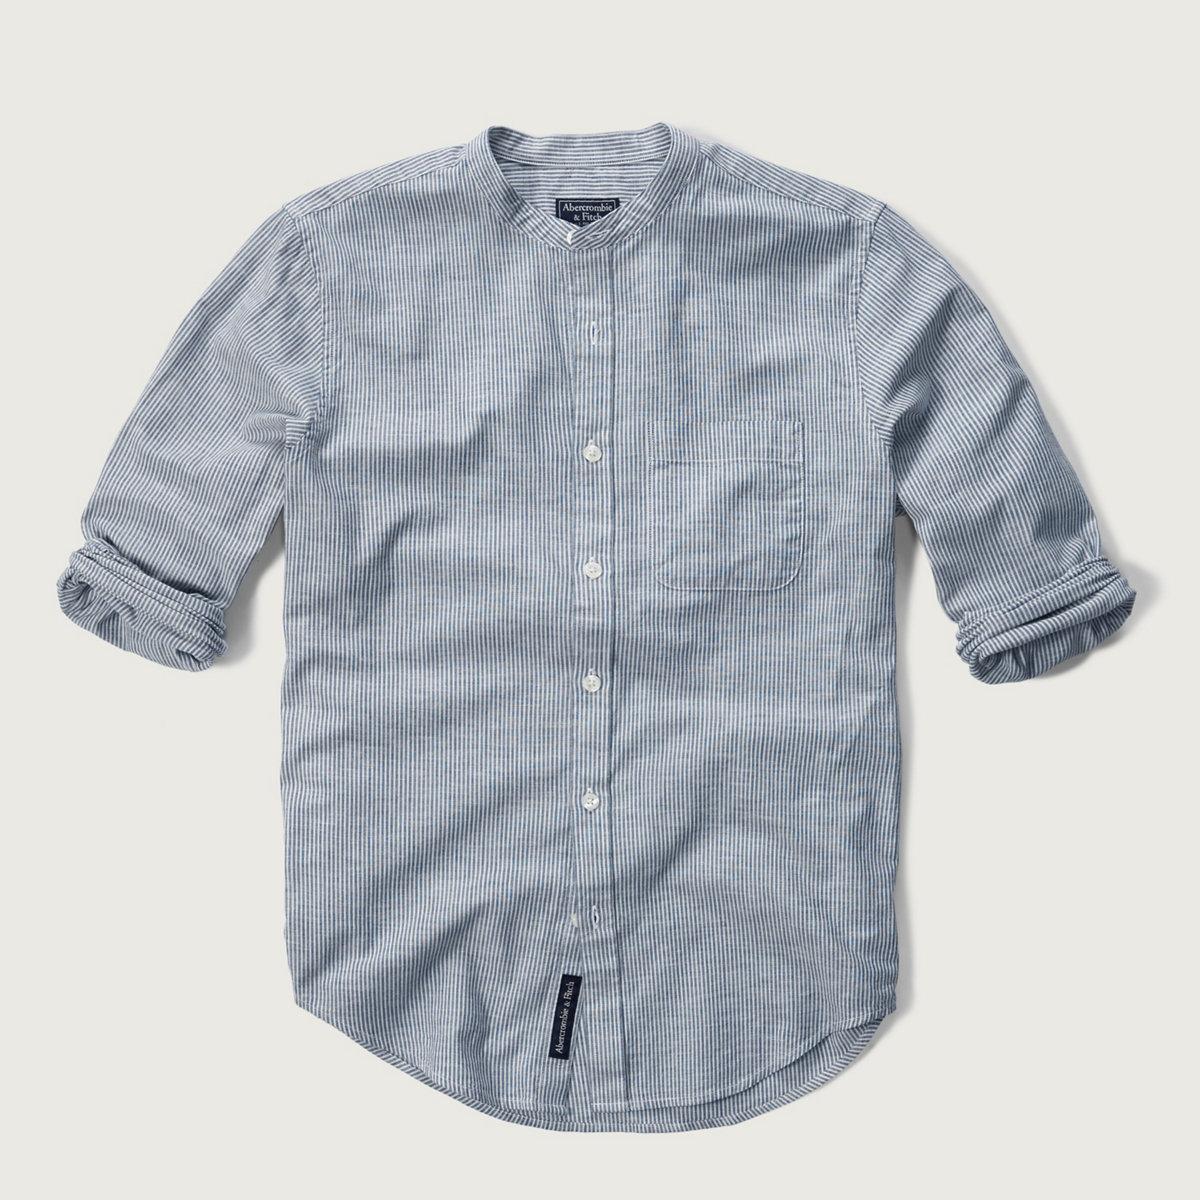 Rustic Texture Shirt